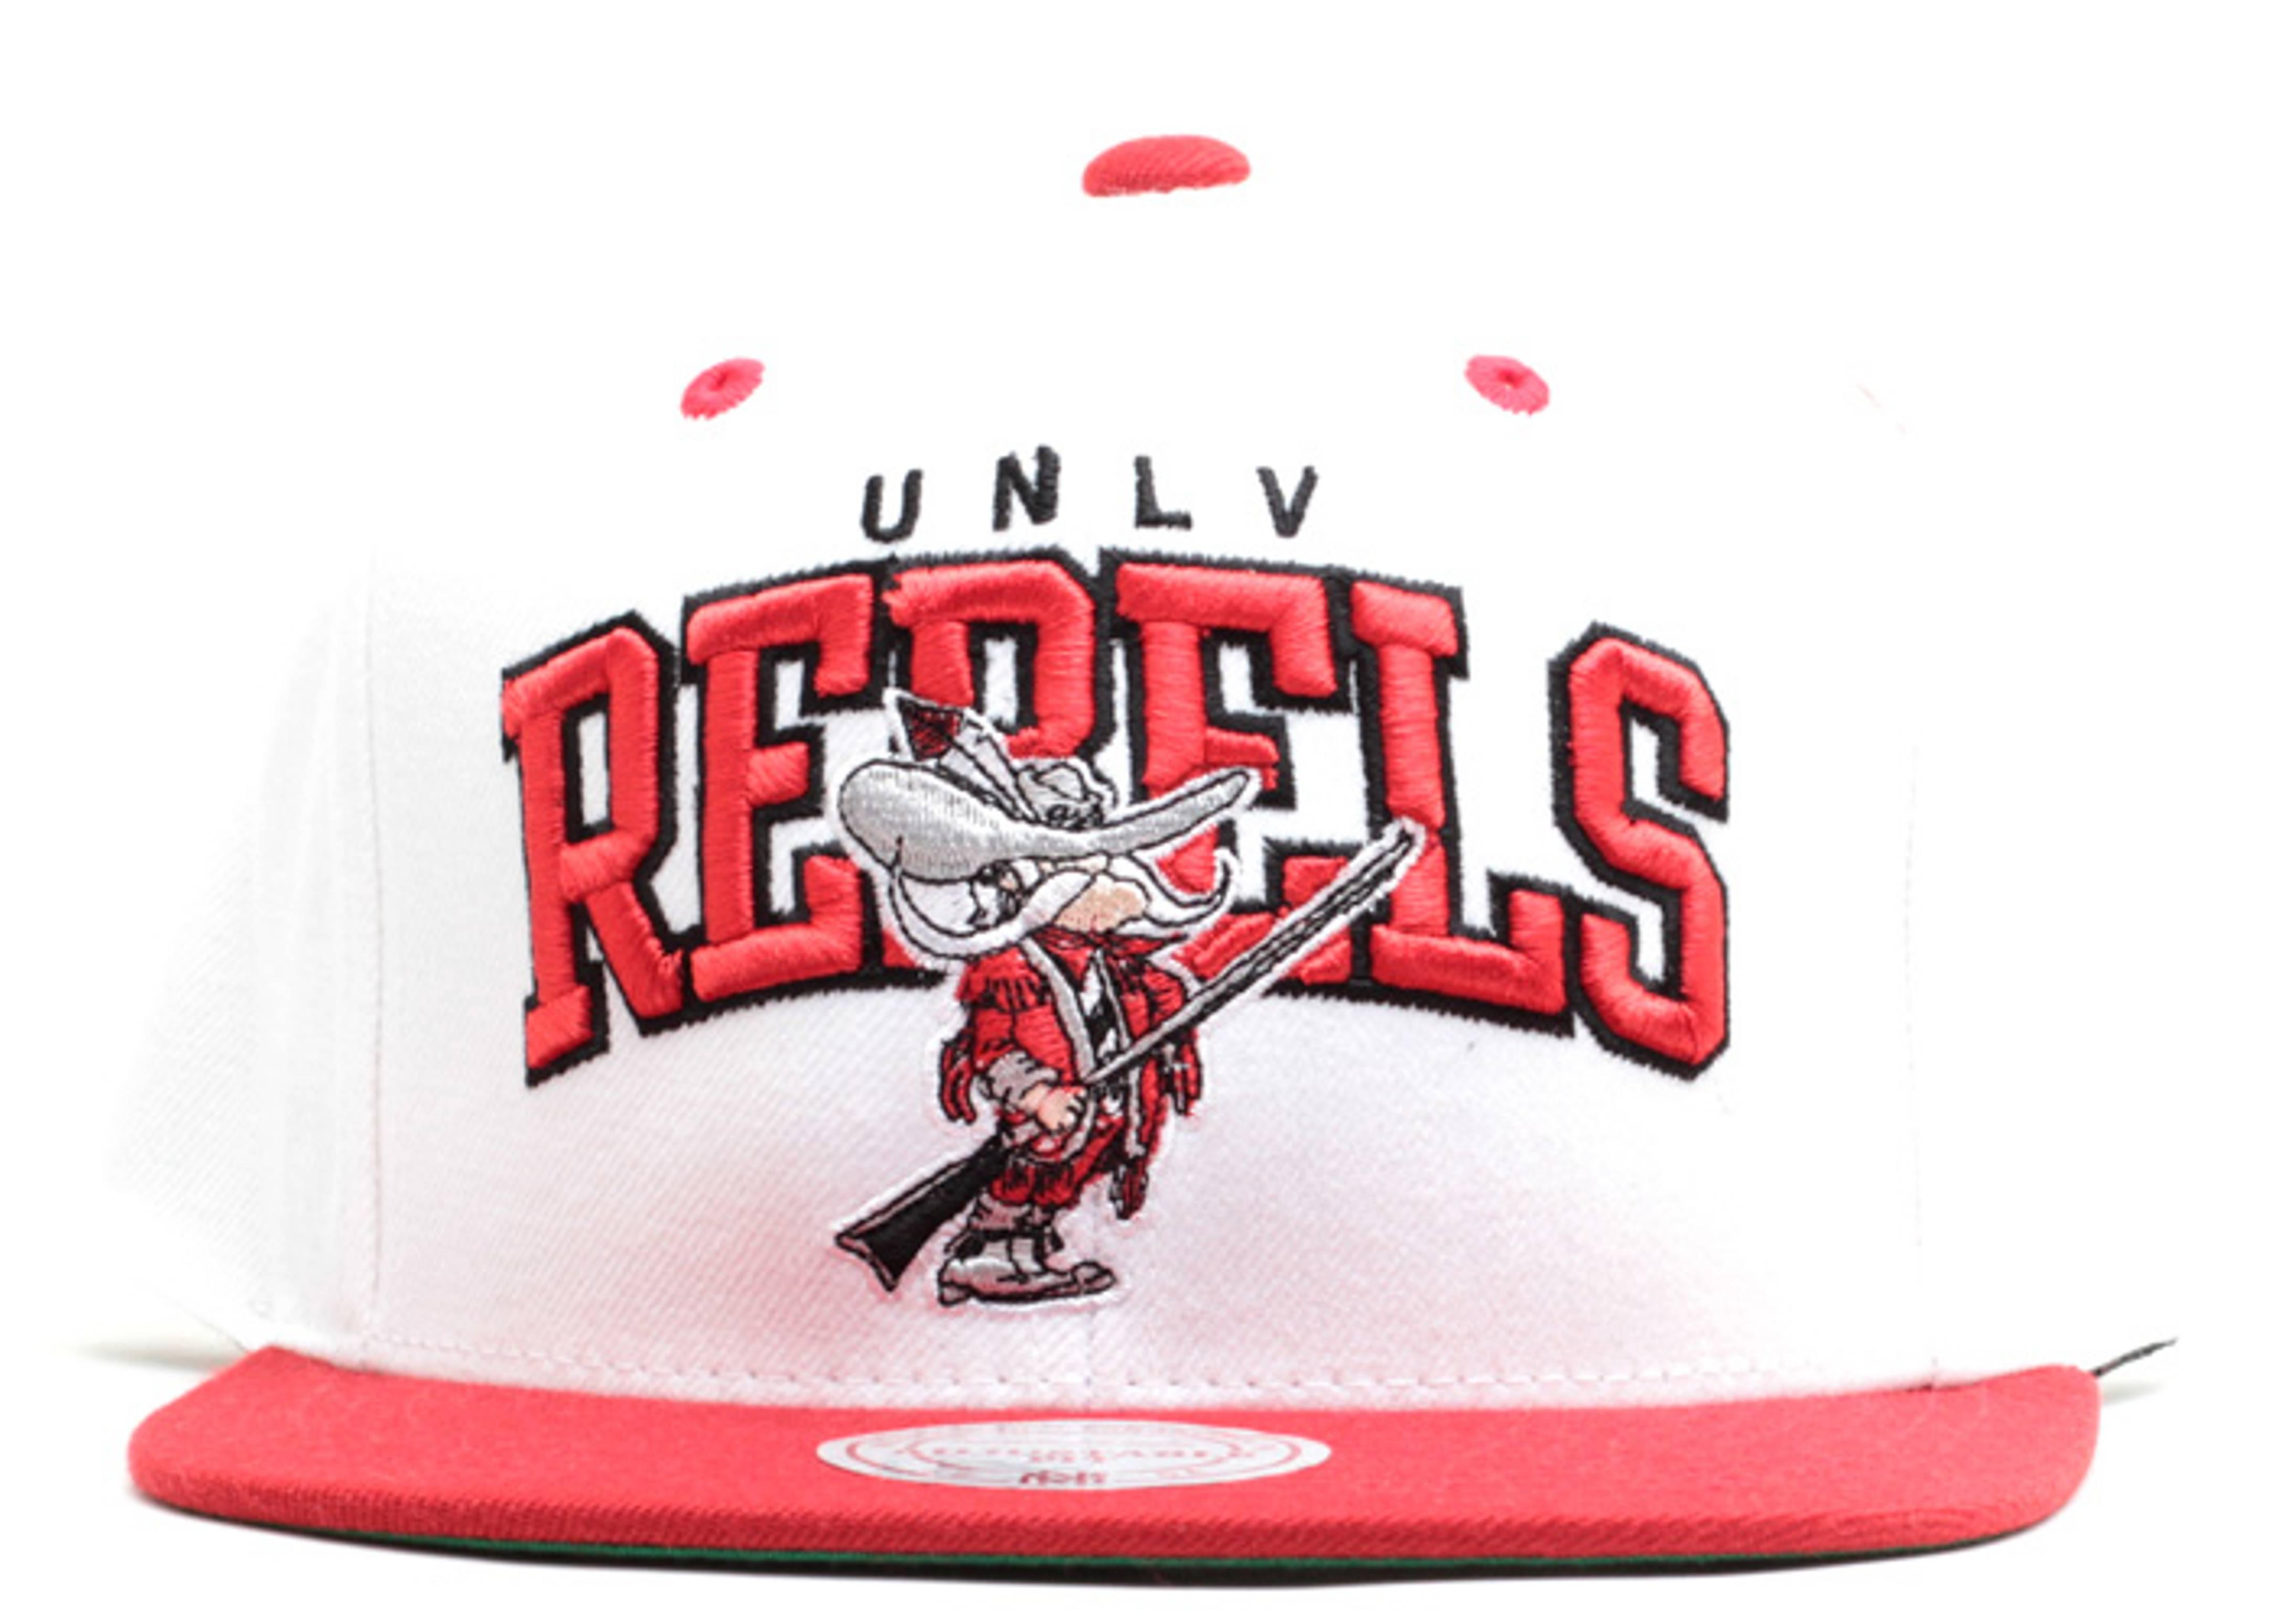 unlv rebels snap-back white/red-blk